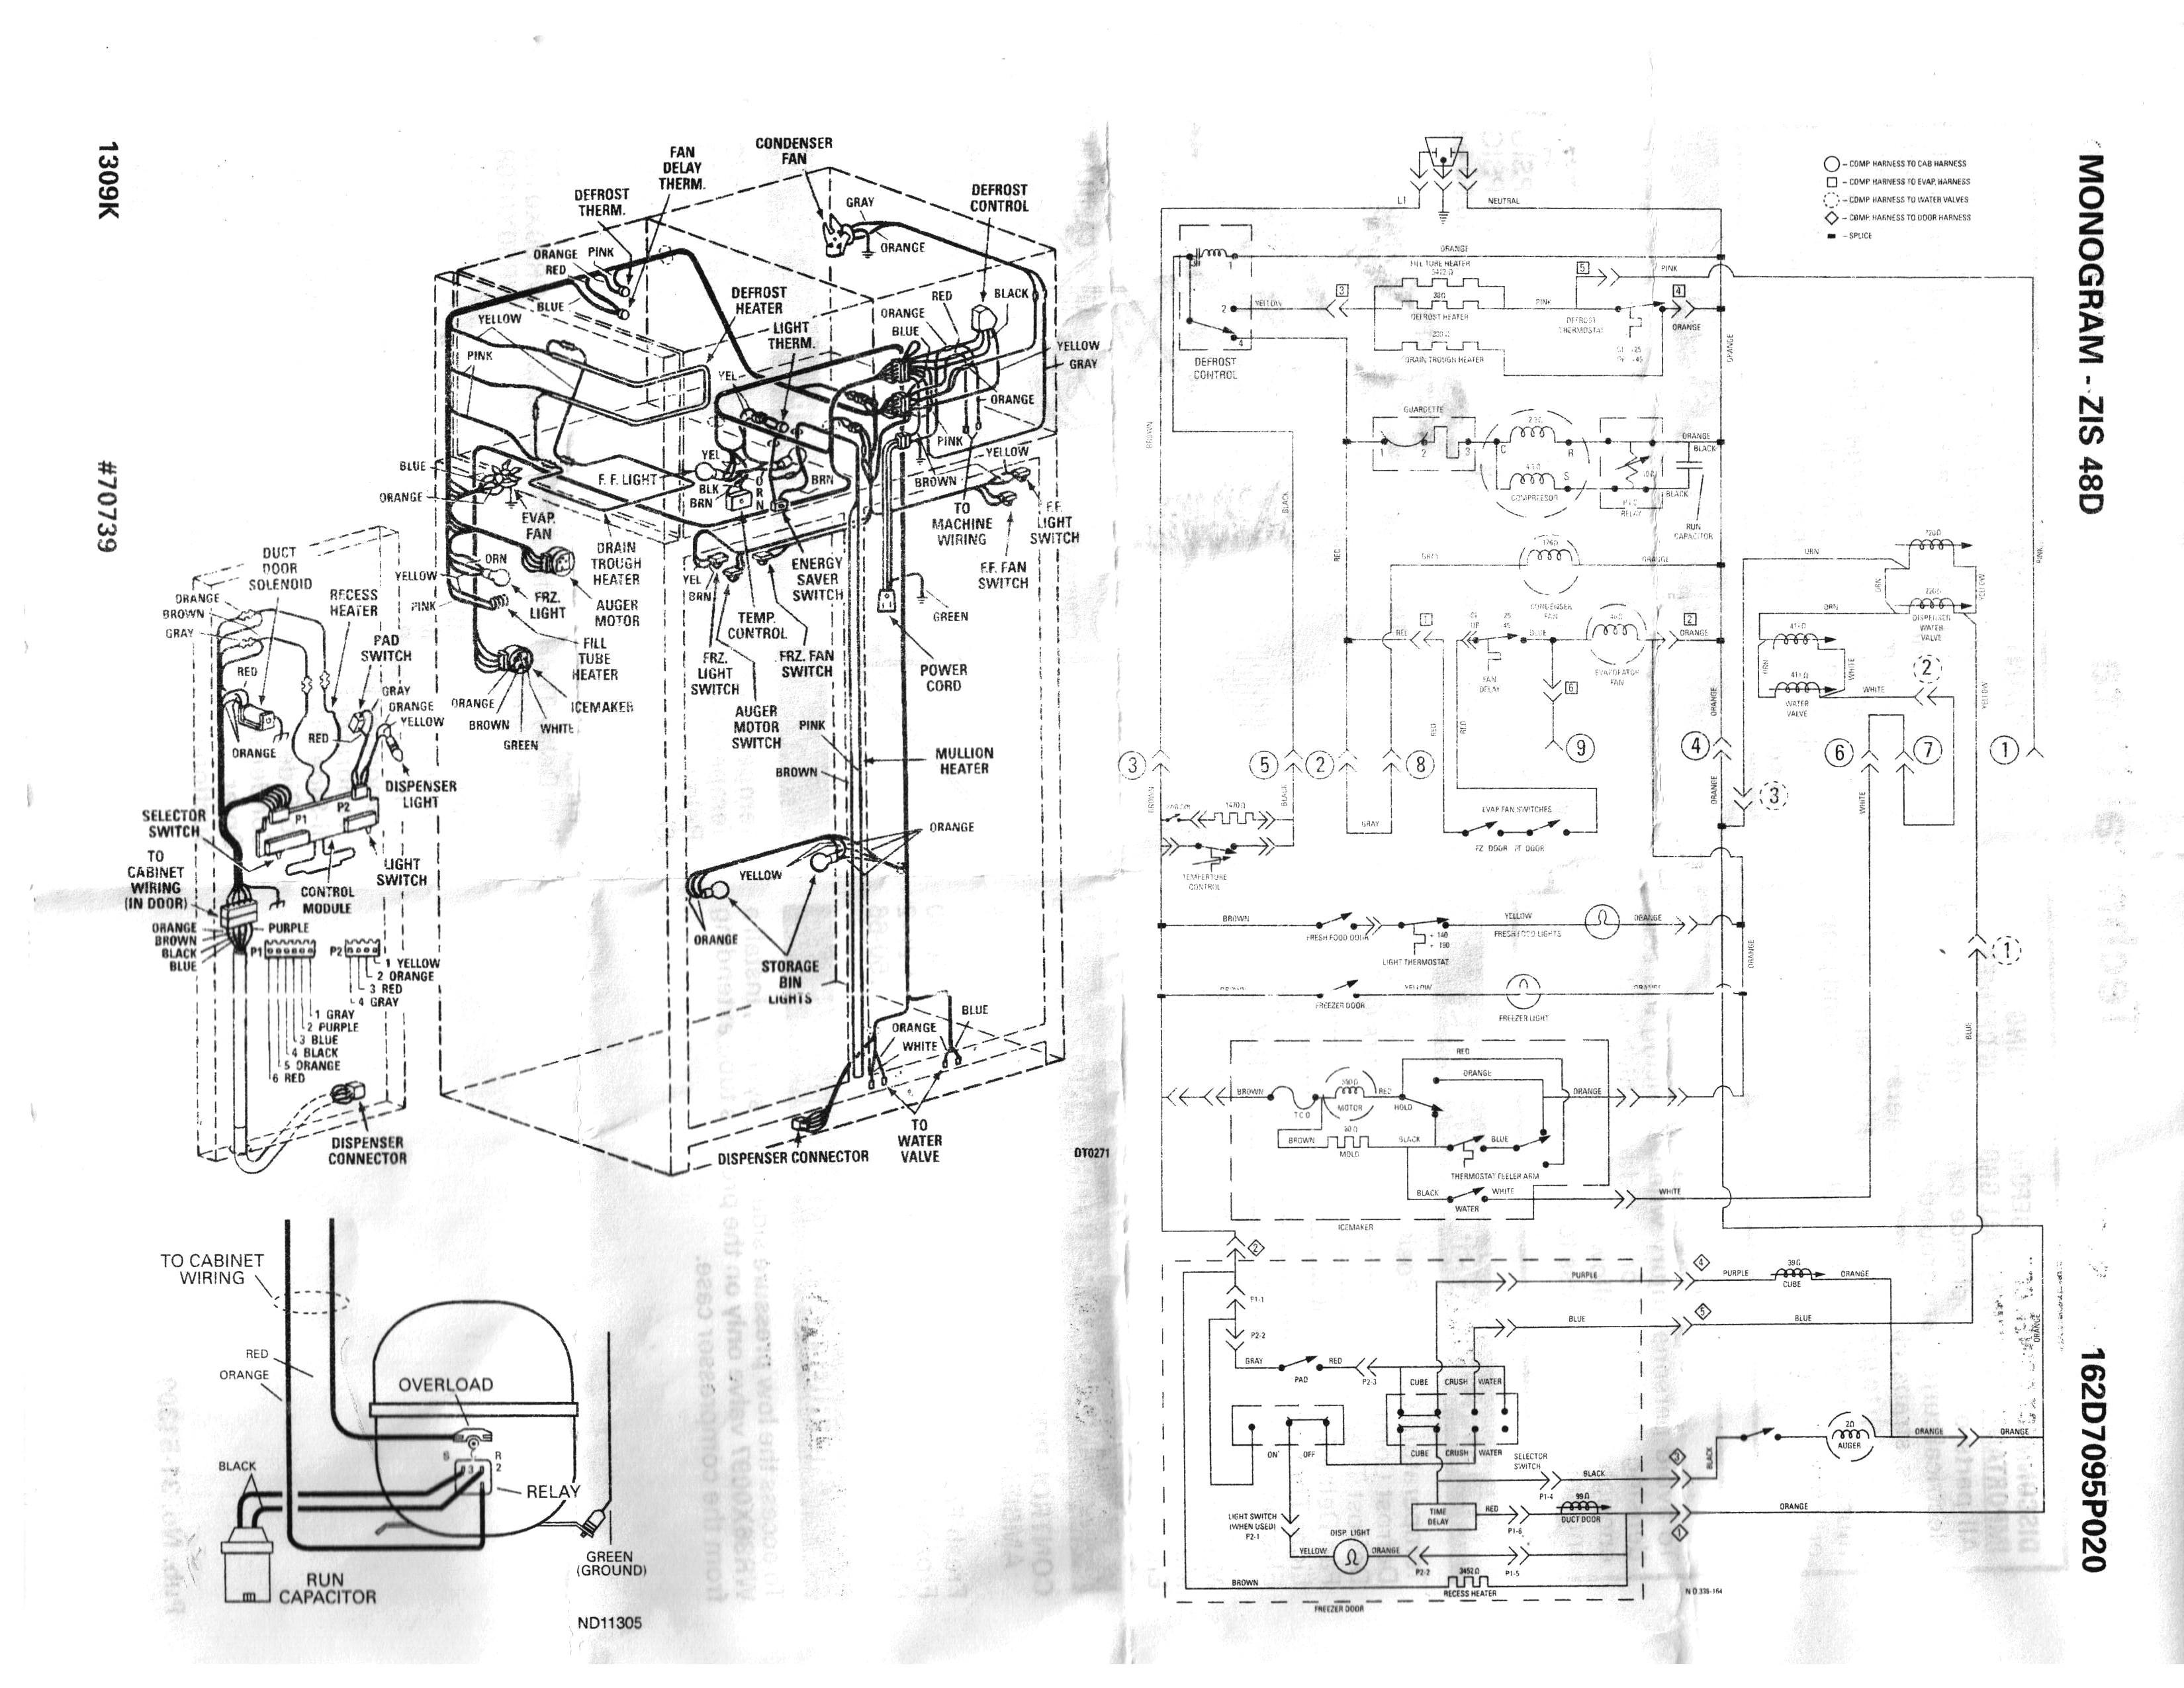 ge refrigerator wiring diagram problem 1995 honda civic distributor diagrams s2 wingblog de ice maker auto electrical rh wiringdiagramstake herokuapp com